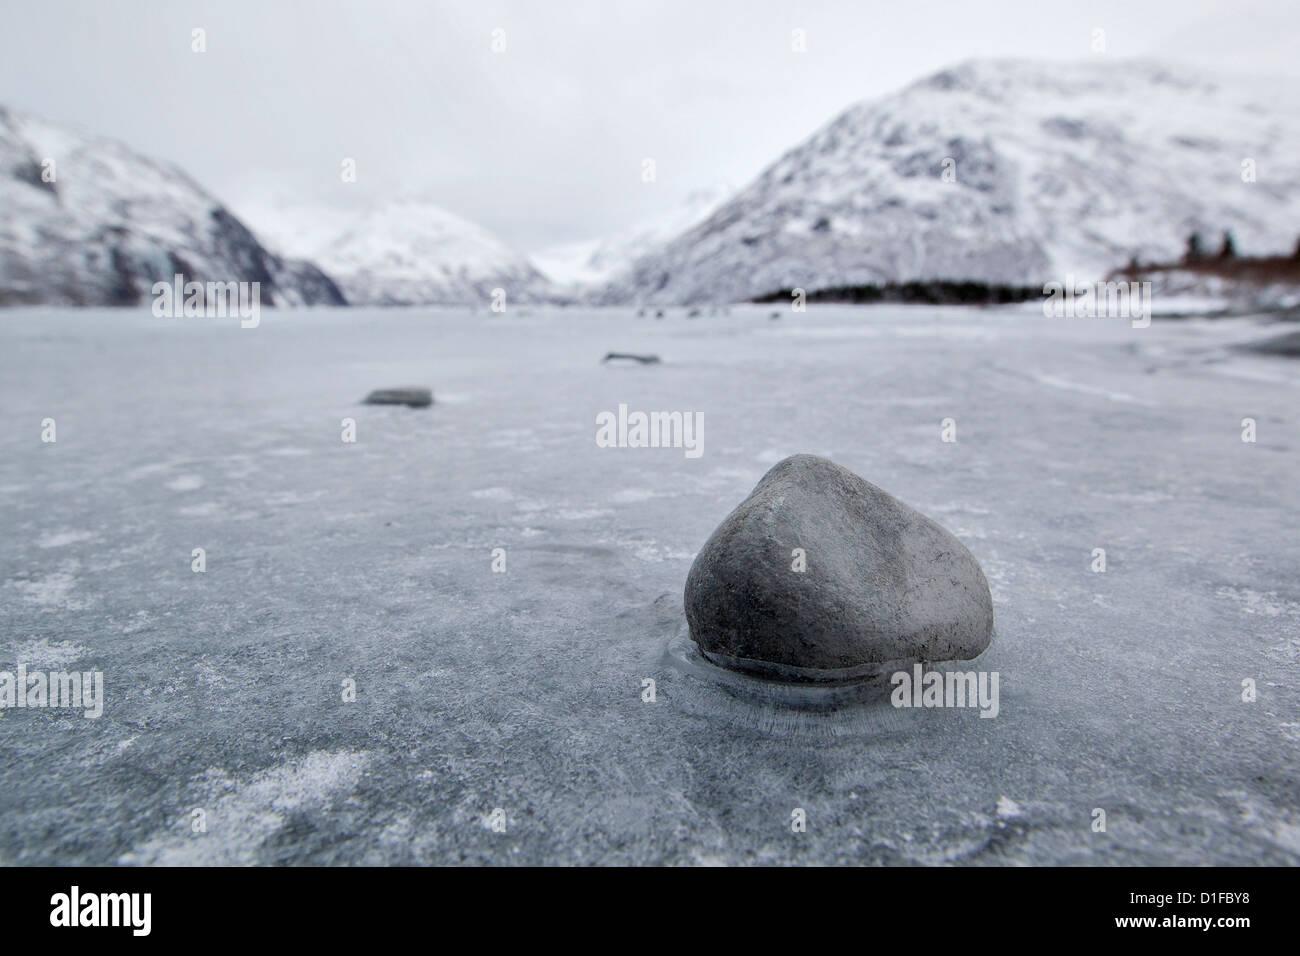 Portage Lake, Portage Glacier, frozen landscape, Chugach Mountains, Alaska - Stock Image